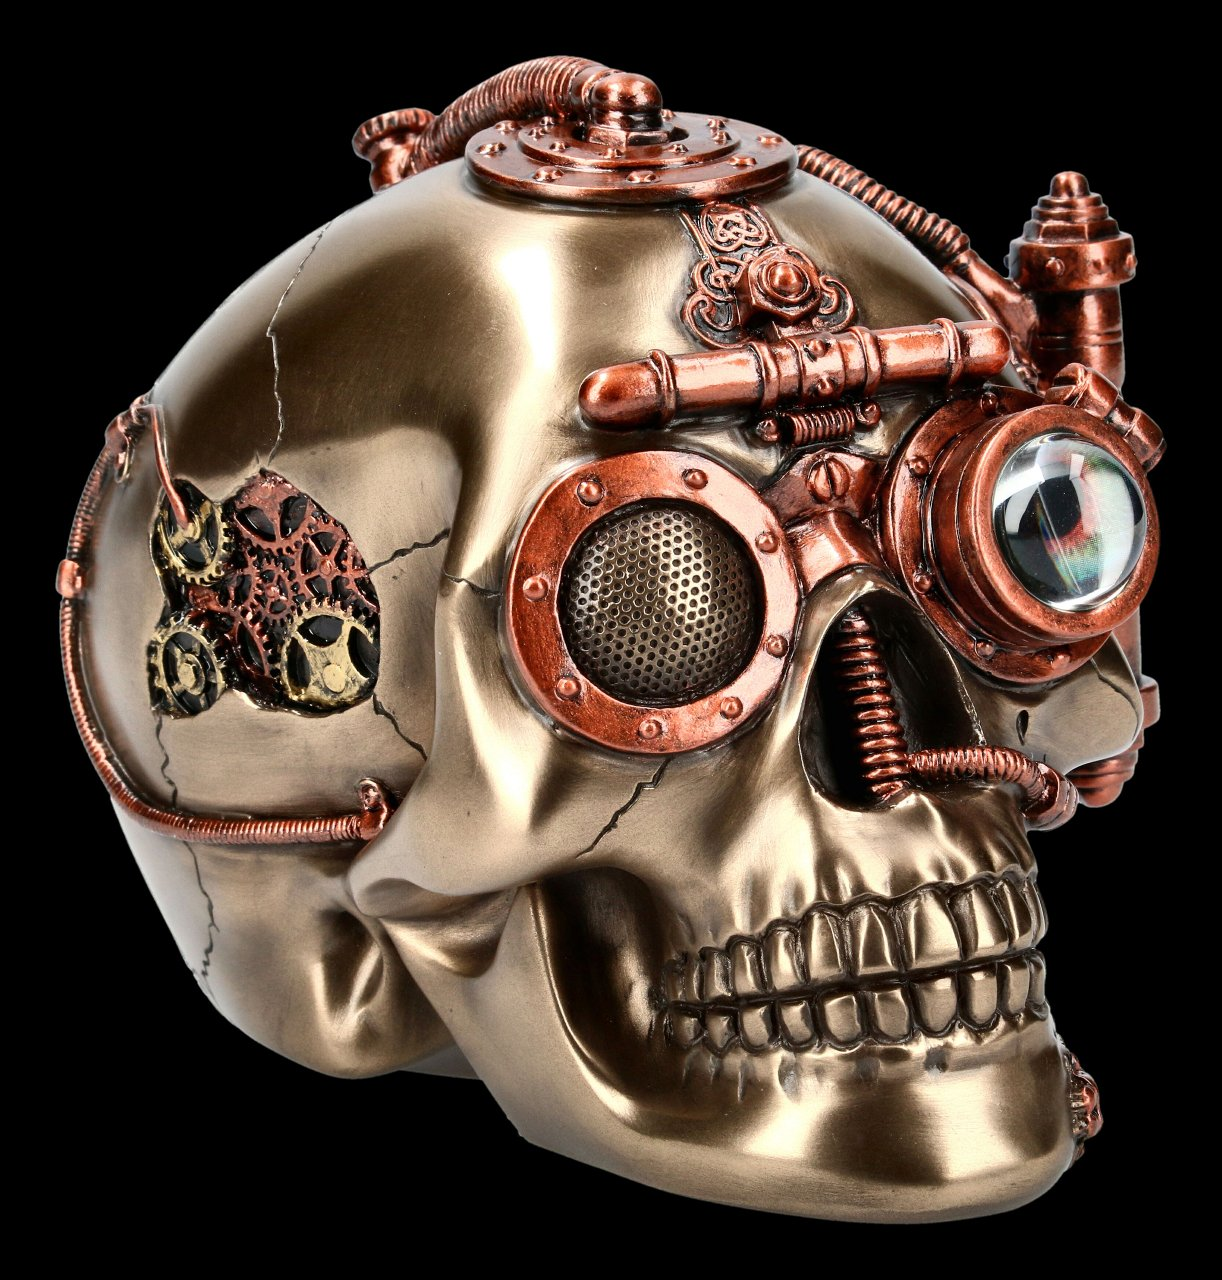 Steampunk Skull Box - Steam Powered Observation